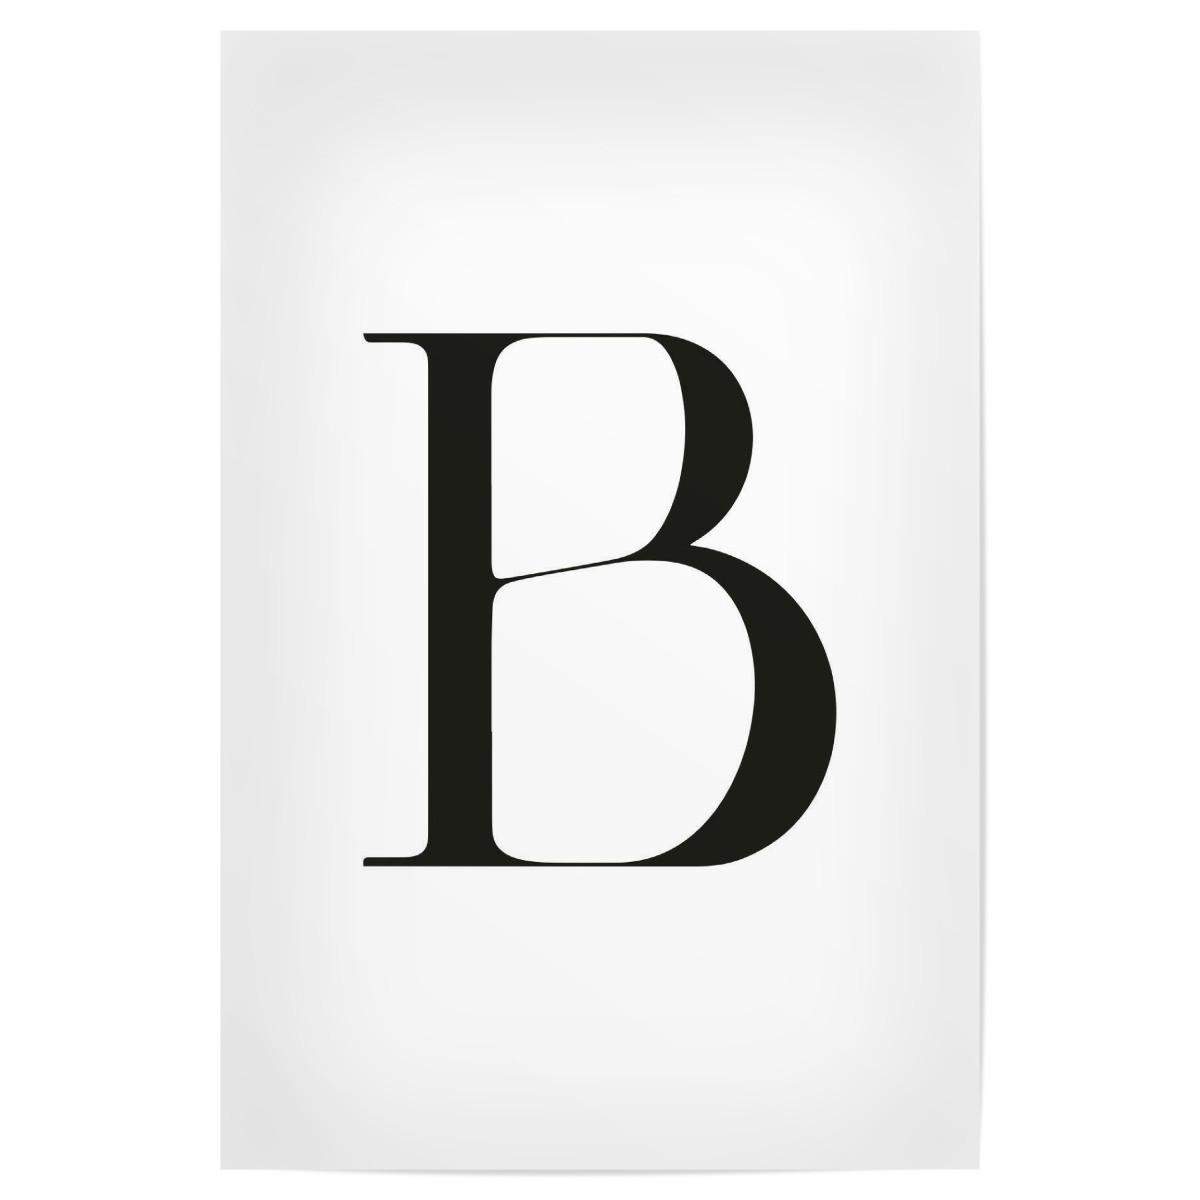 B&s 290400 Vanguard 12hp запчасти Buchstabe – B (30×20 Cm Poster) Of B&s 290400 Vanguard 12hp запчасти